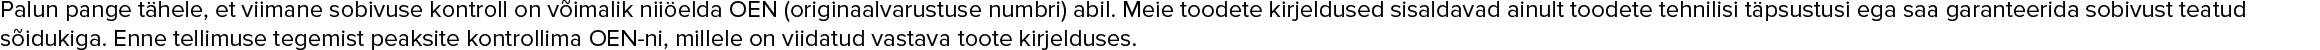 MEYLE 1J0 127 401 A, MFF0031, 1J0 127 401 A, 1J0 127 401 A, 1C0 127 401 Kütusefilter